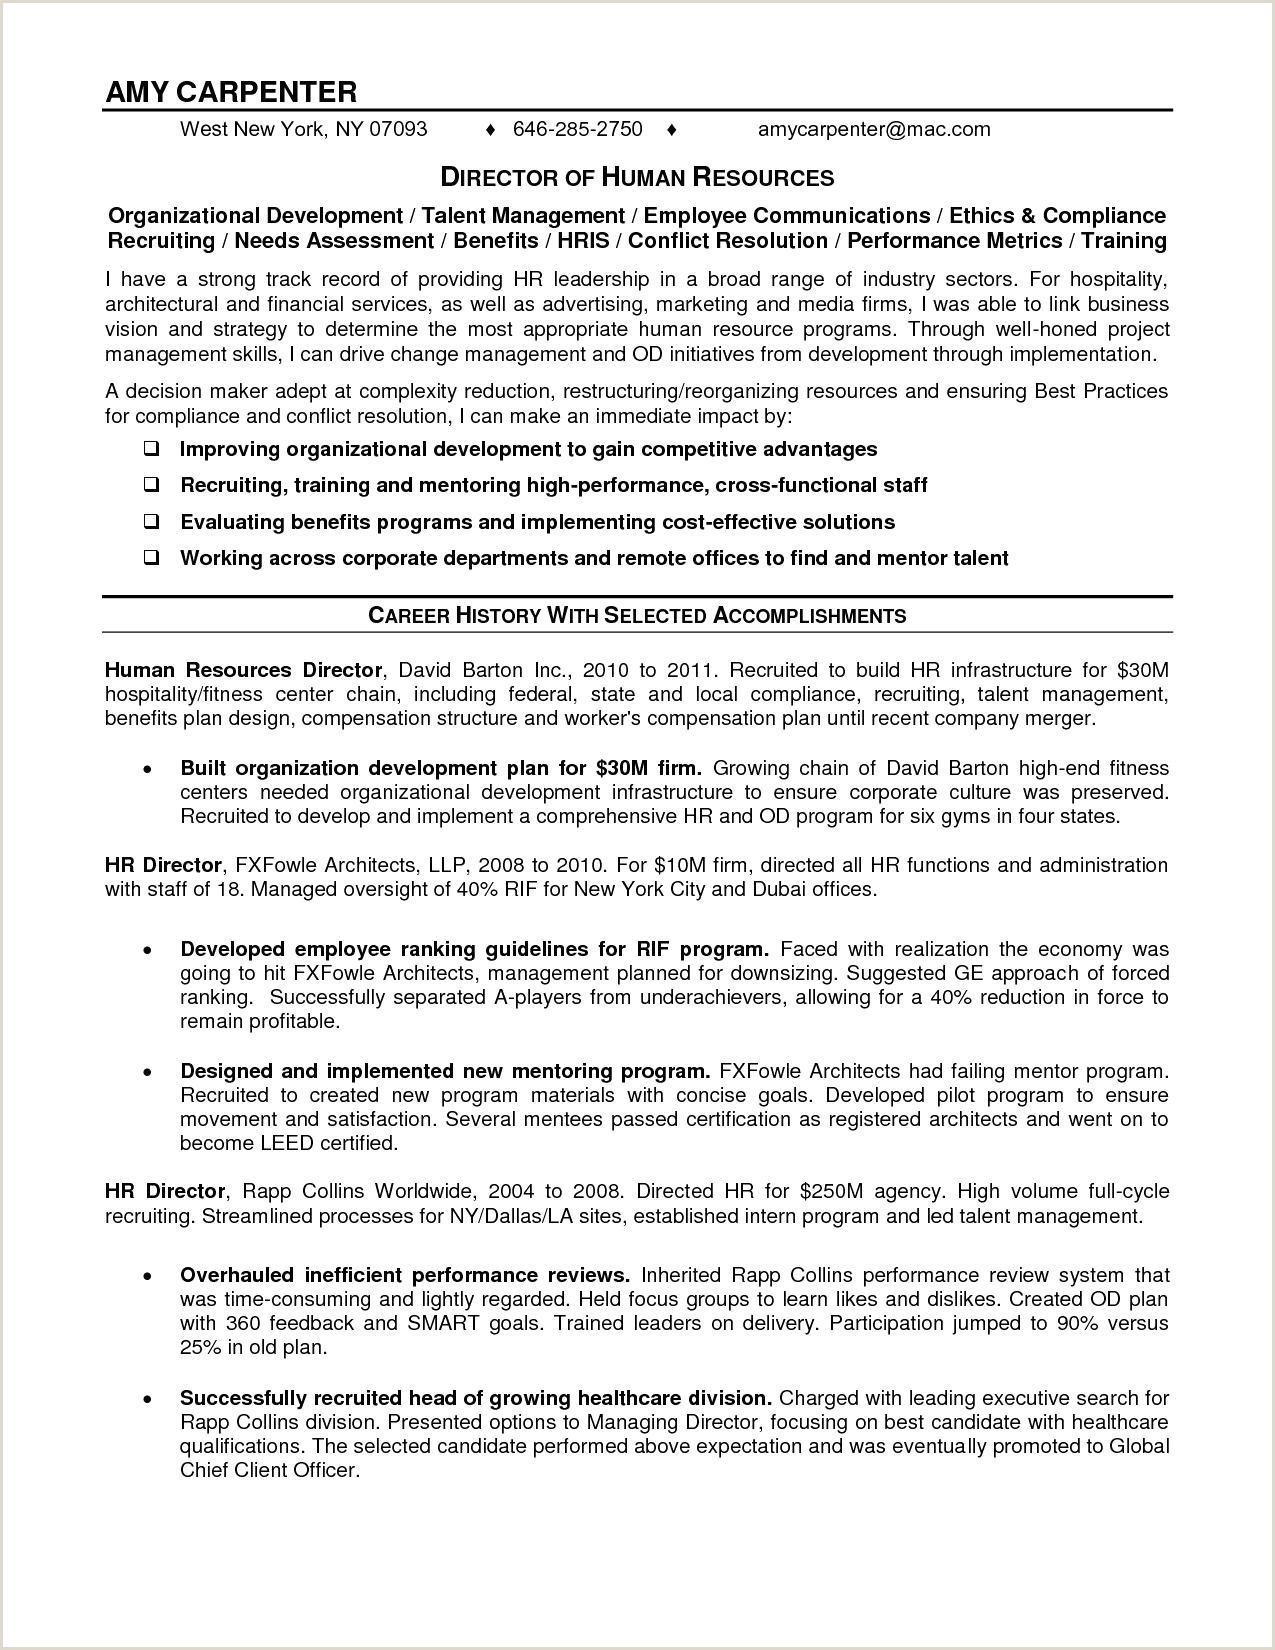 Resume Objective for Mba Admission Mba Student Resume Sample – Salumguilher